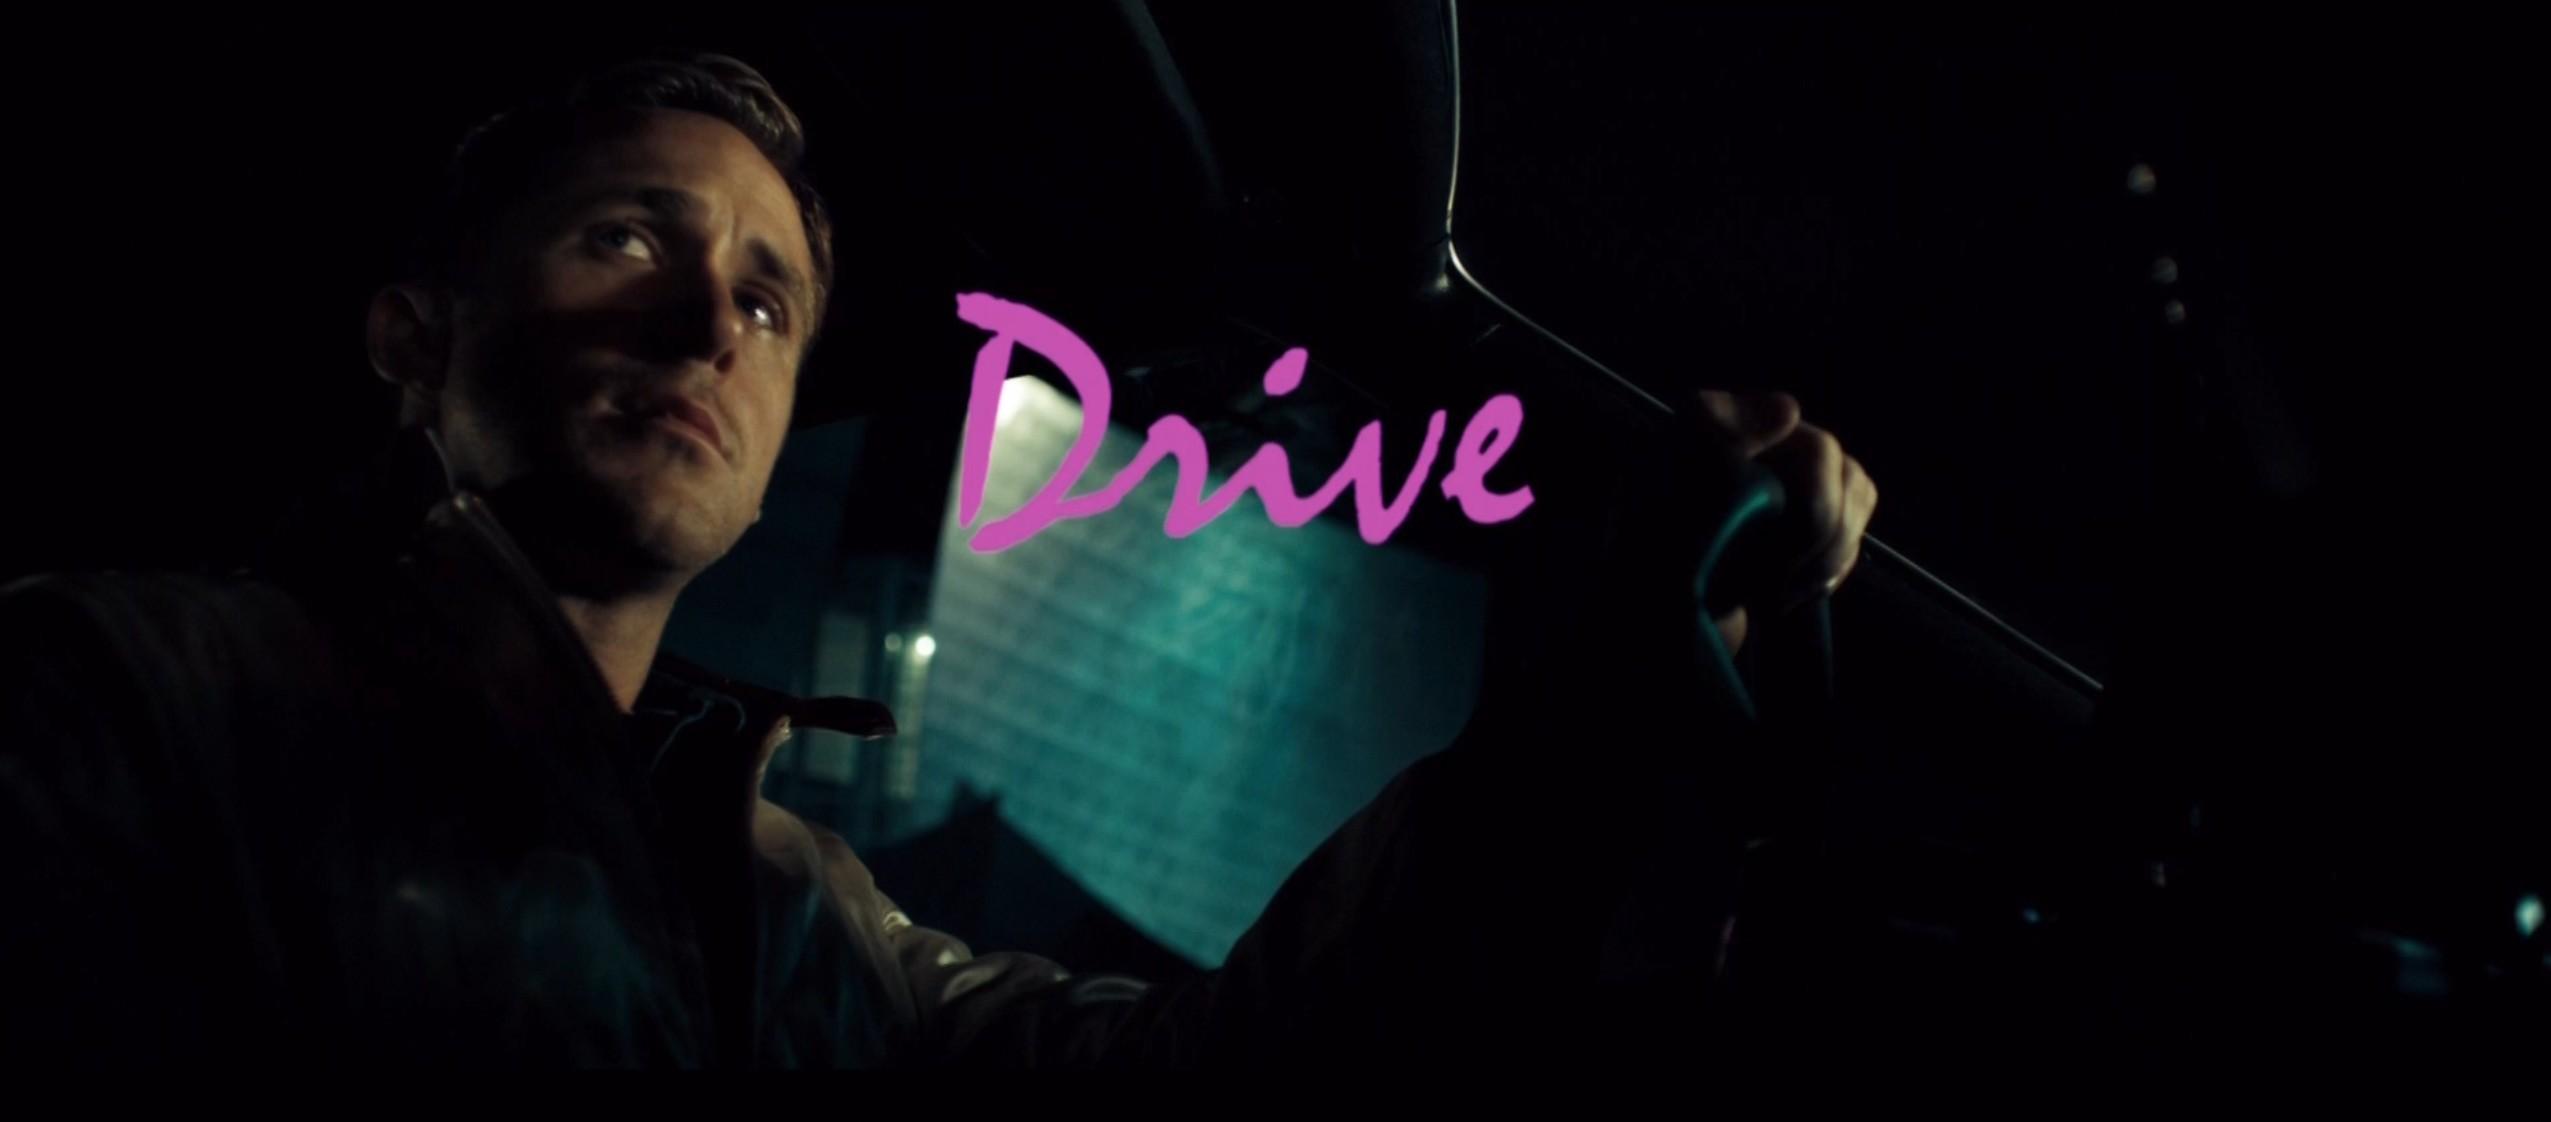 Drive Wallpaper